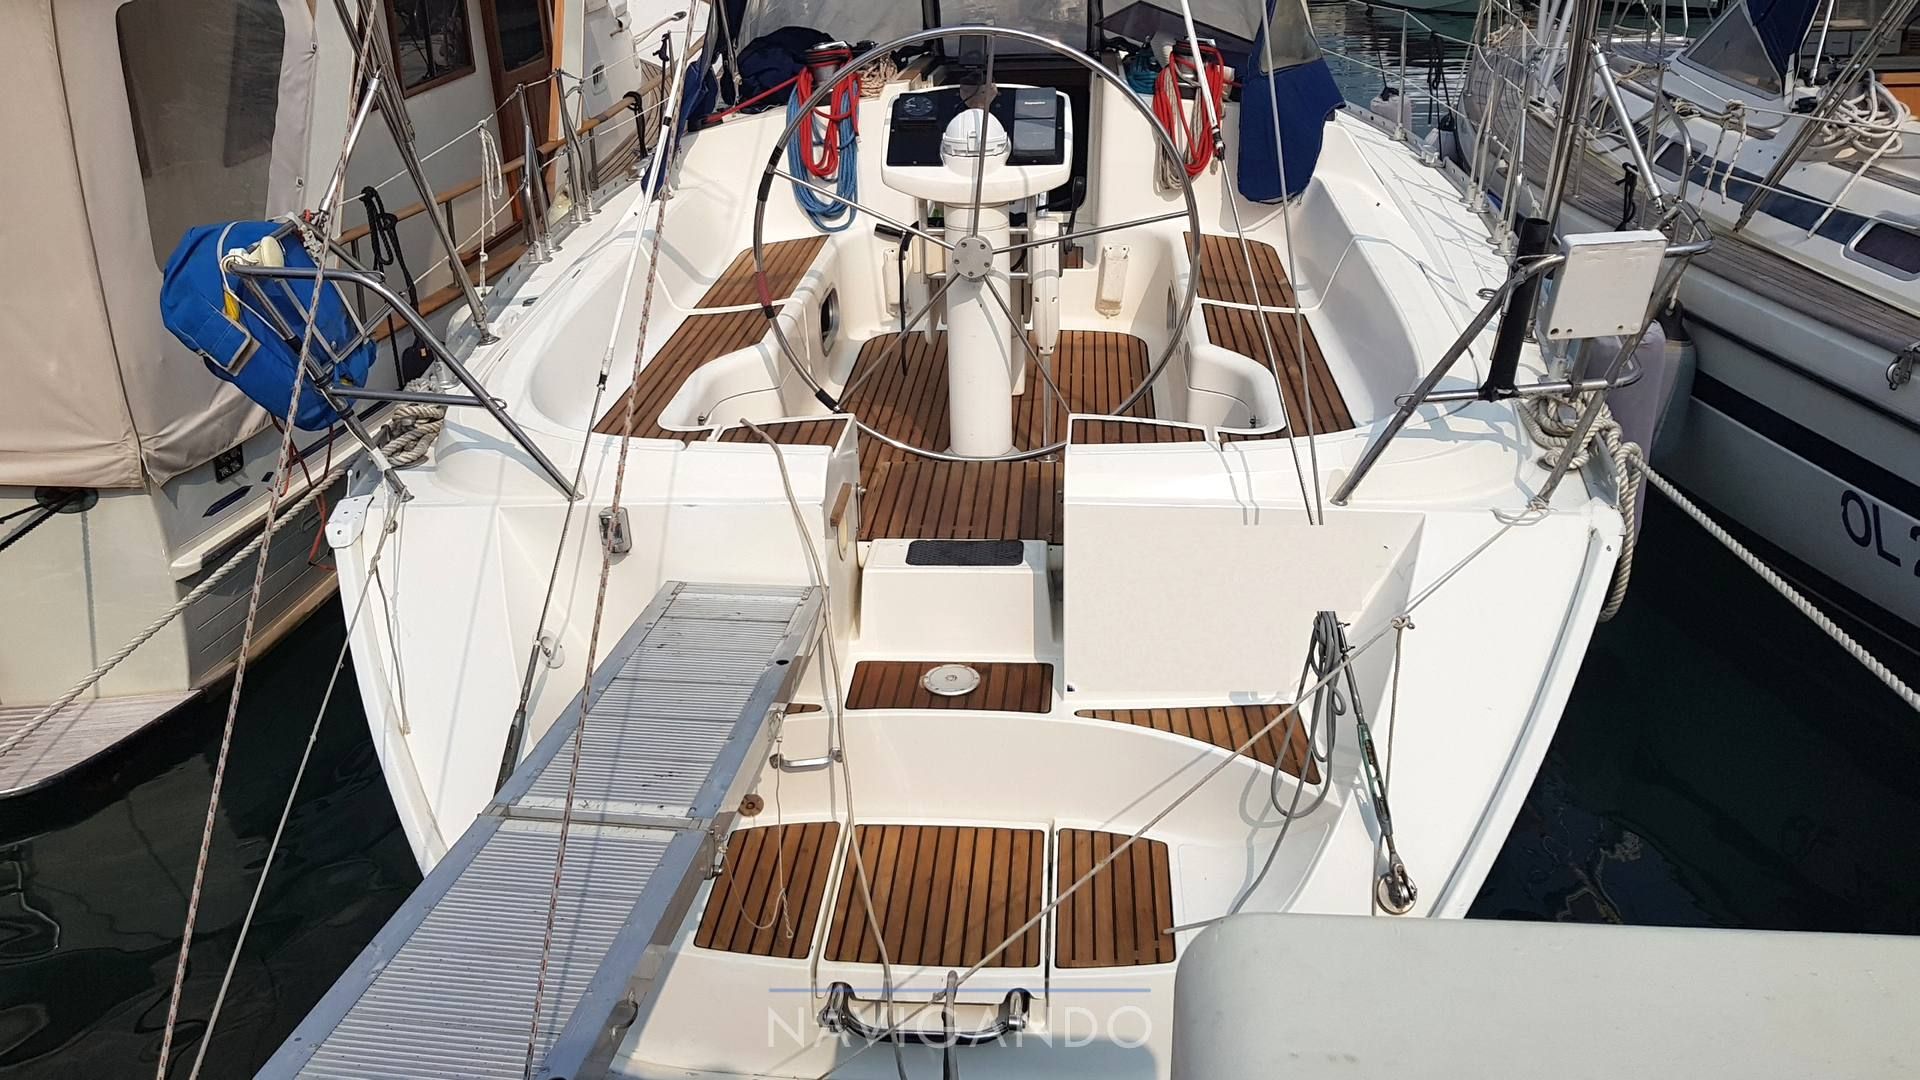 Jeanneau Sun odyssey 42.2 Sail cruiser